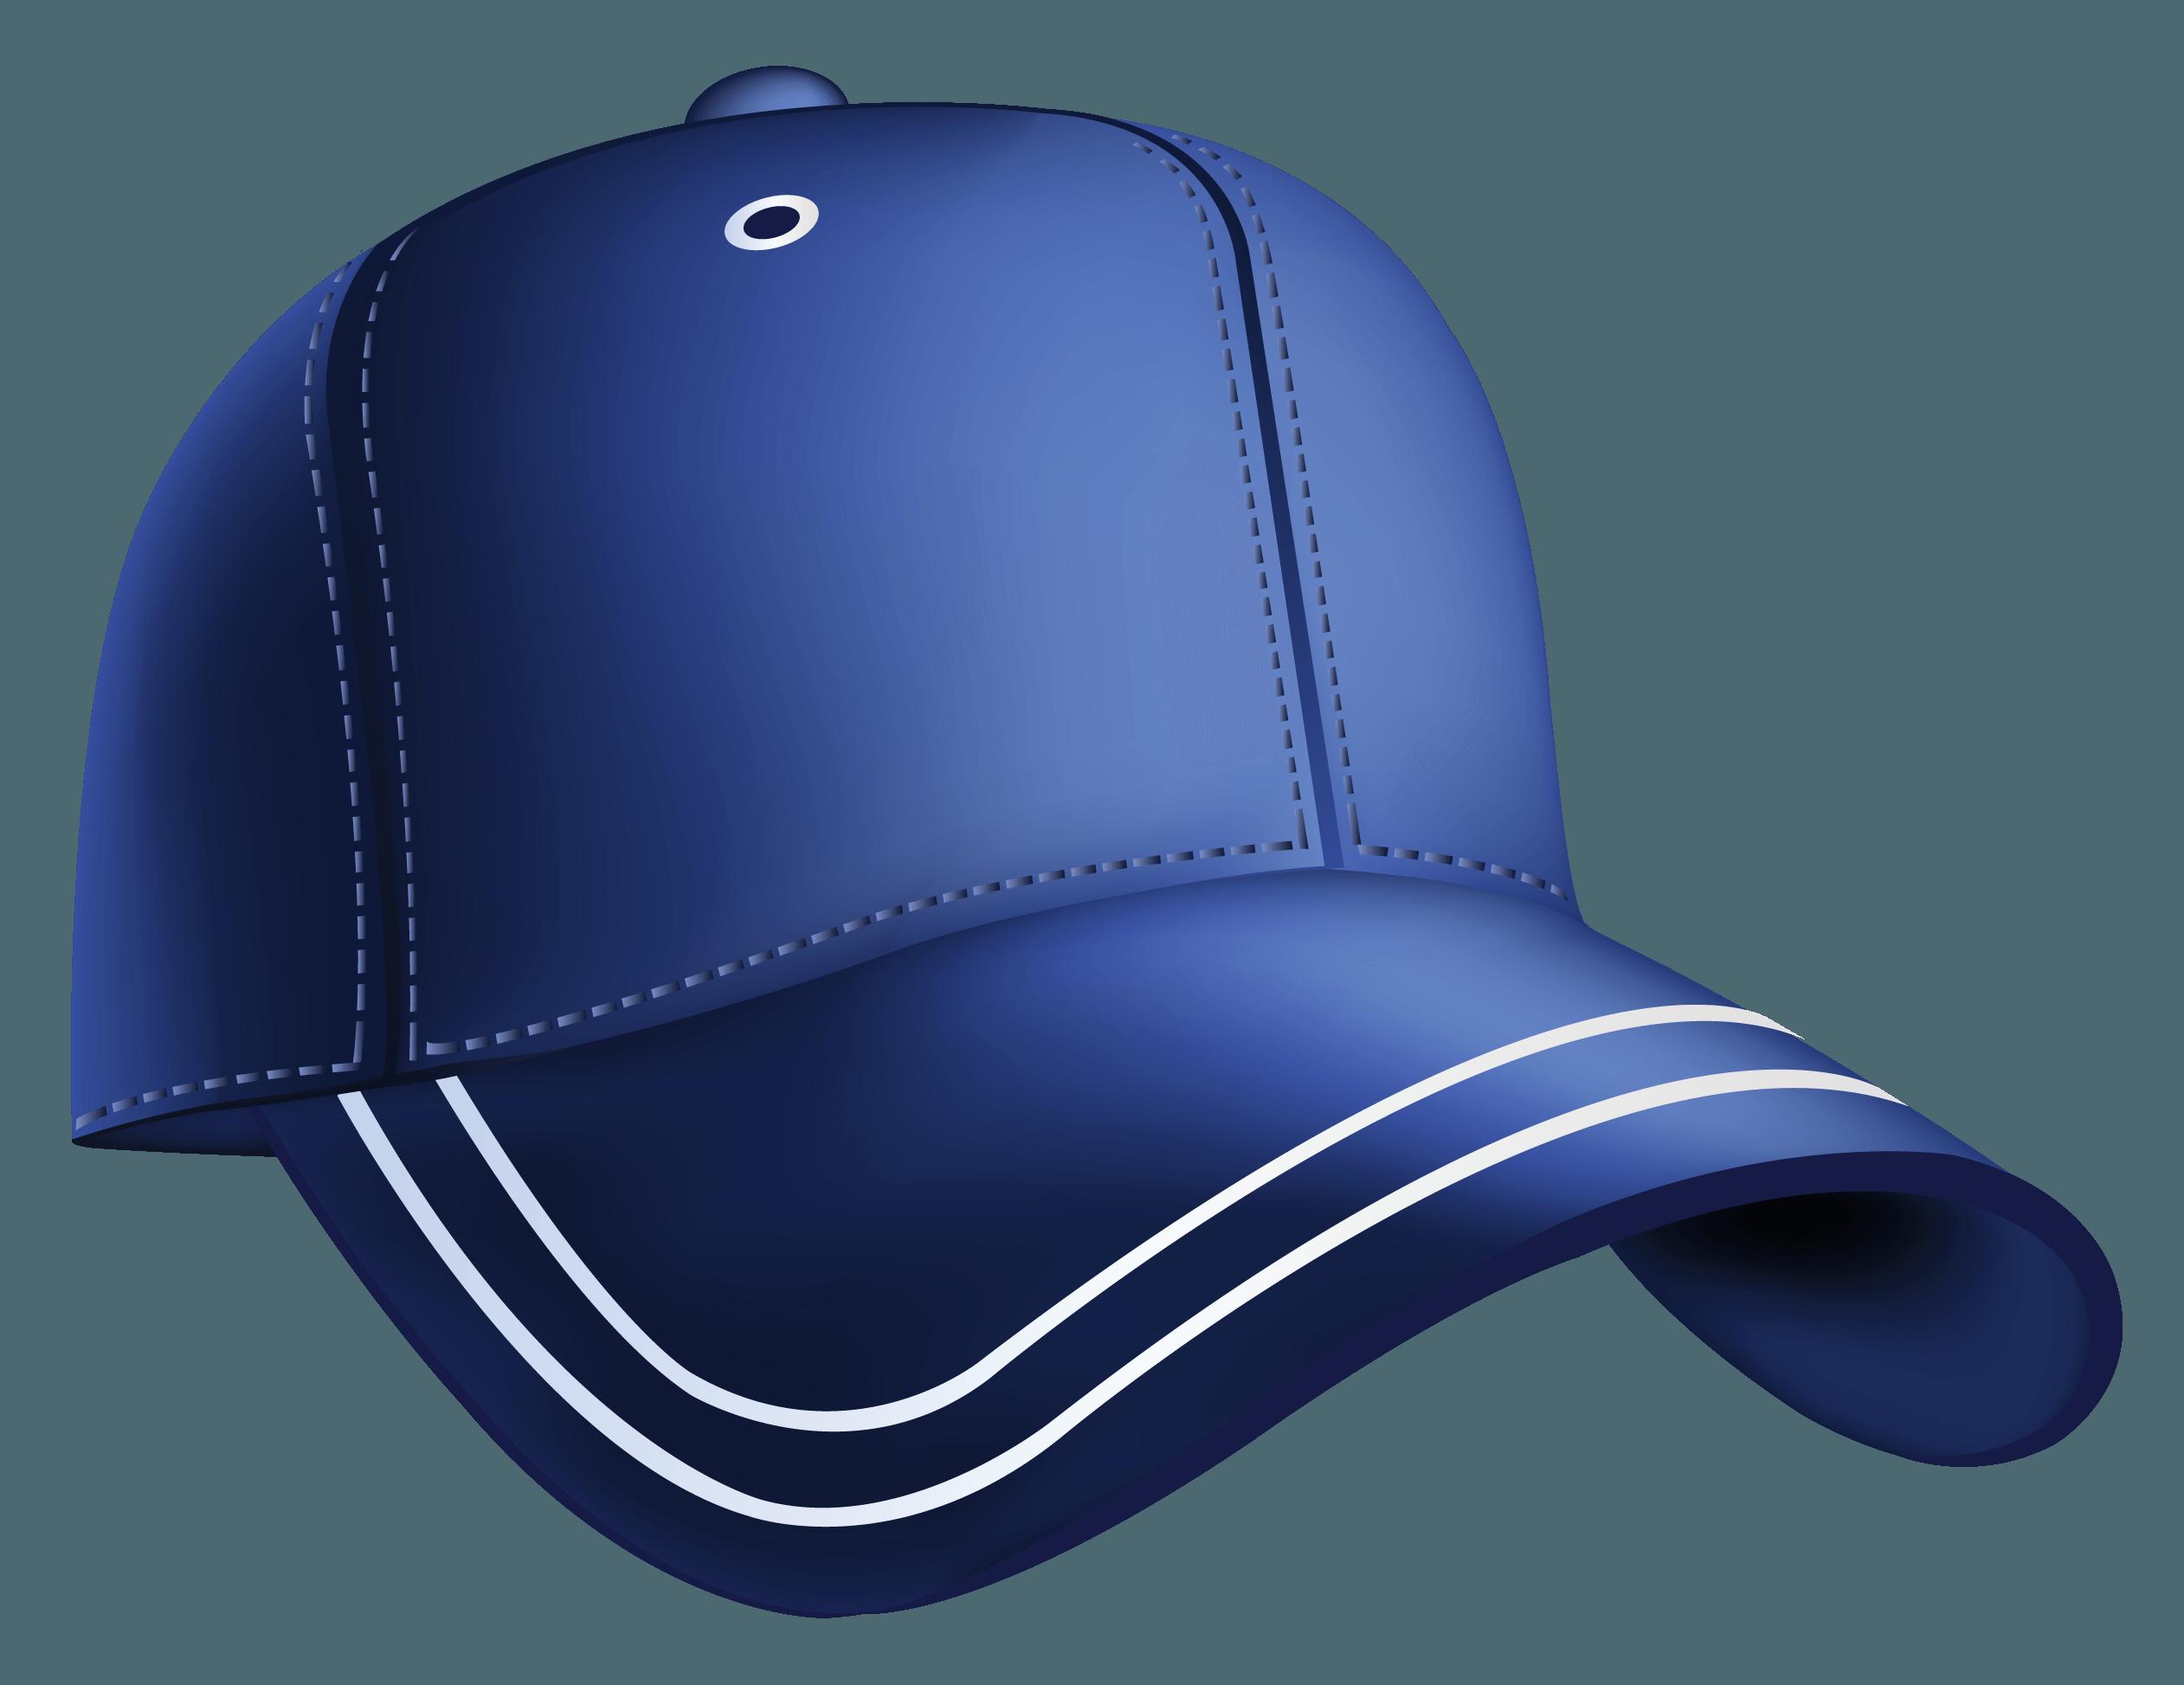 Download Baseball Cap Png Image HQ PNG Image | FreePNGImg clipart transparent download